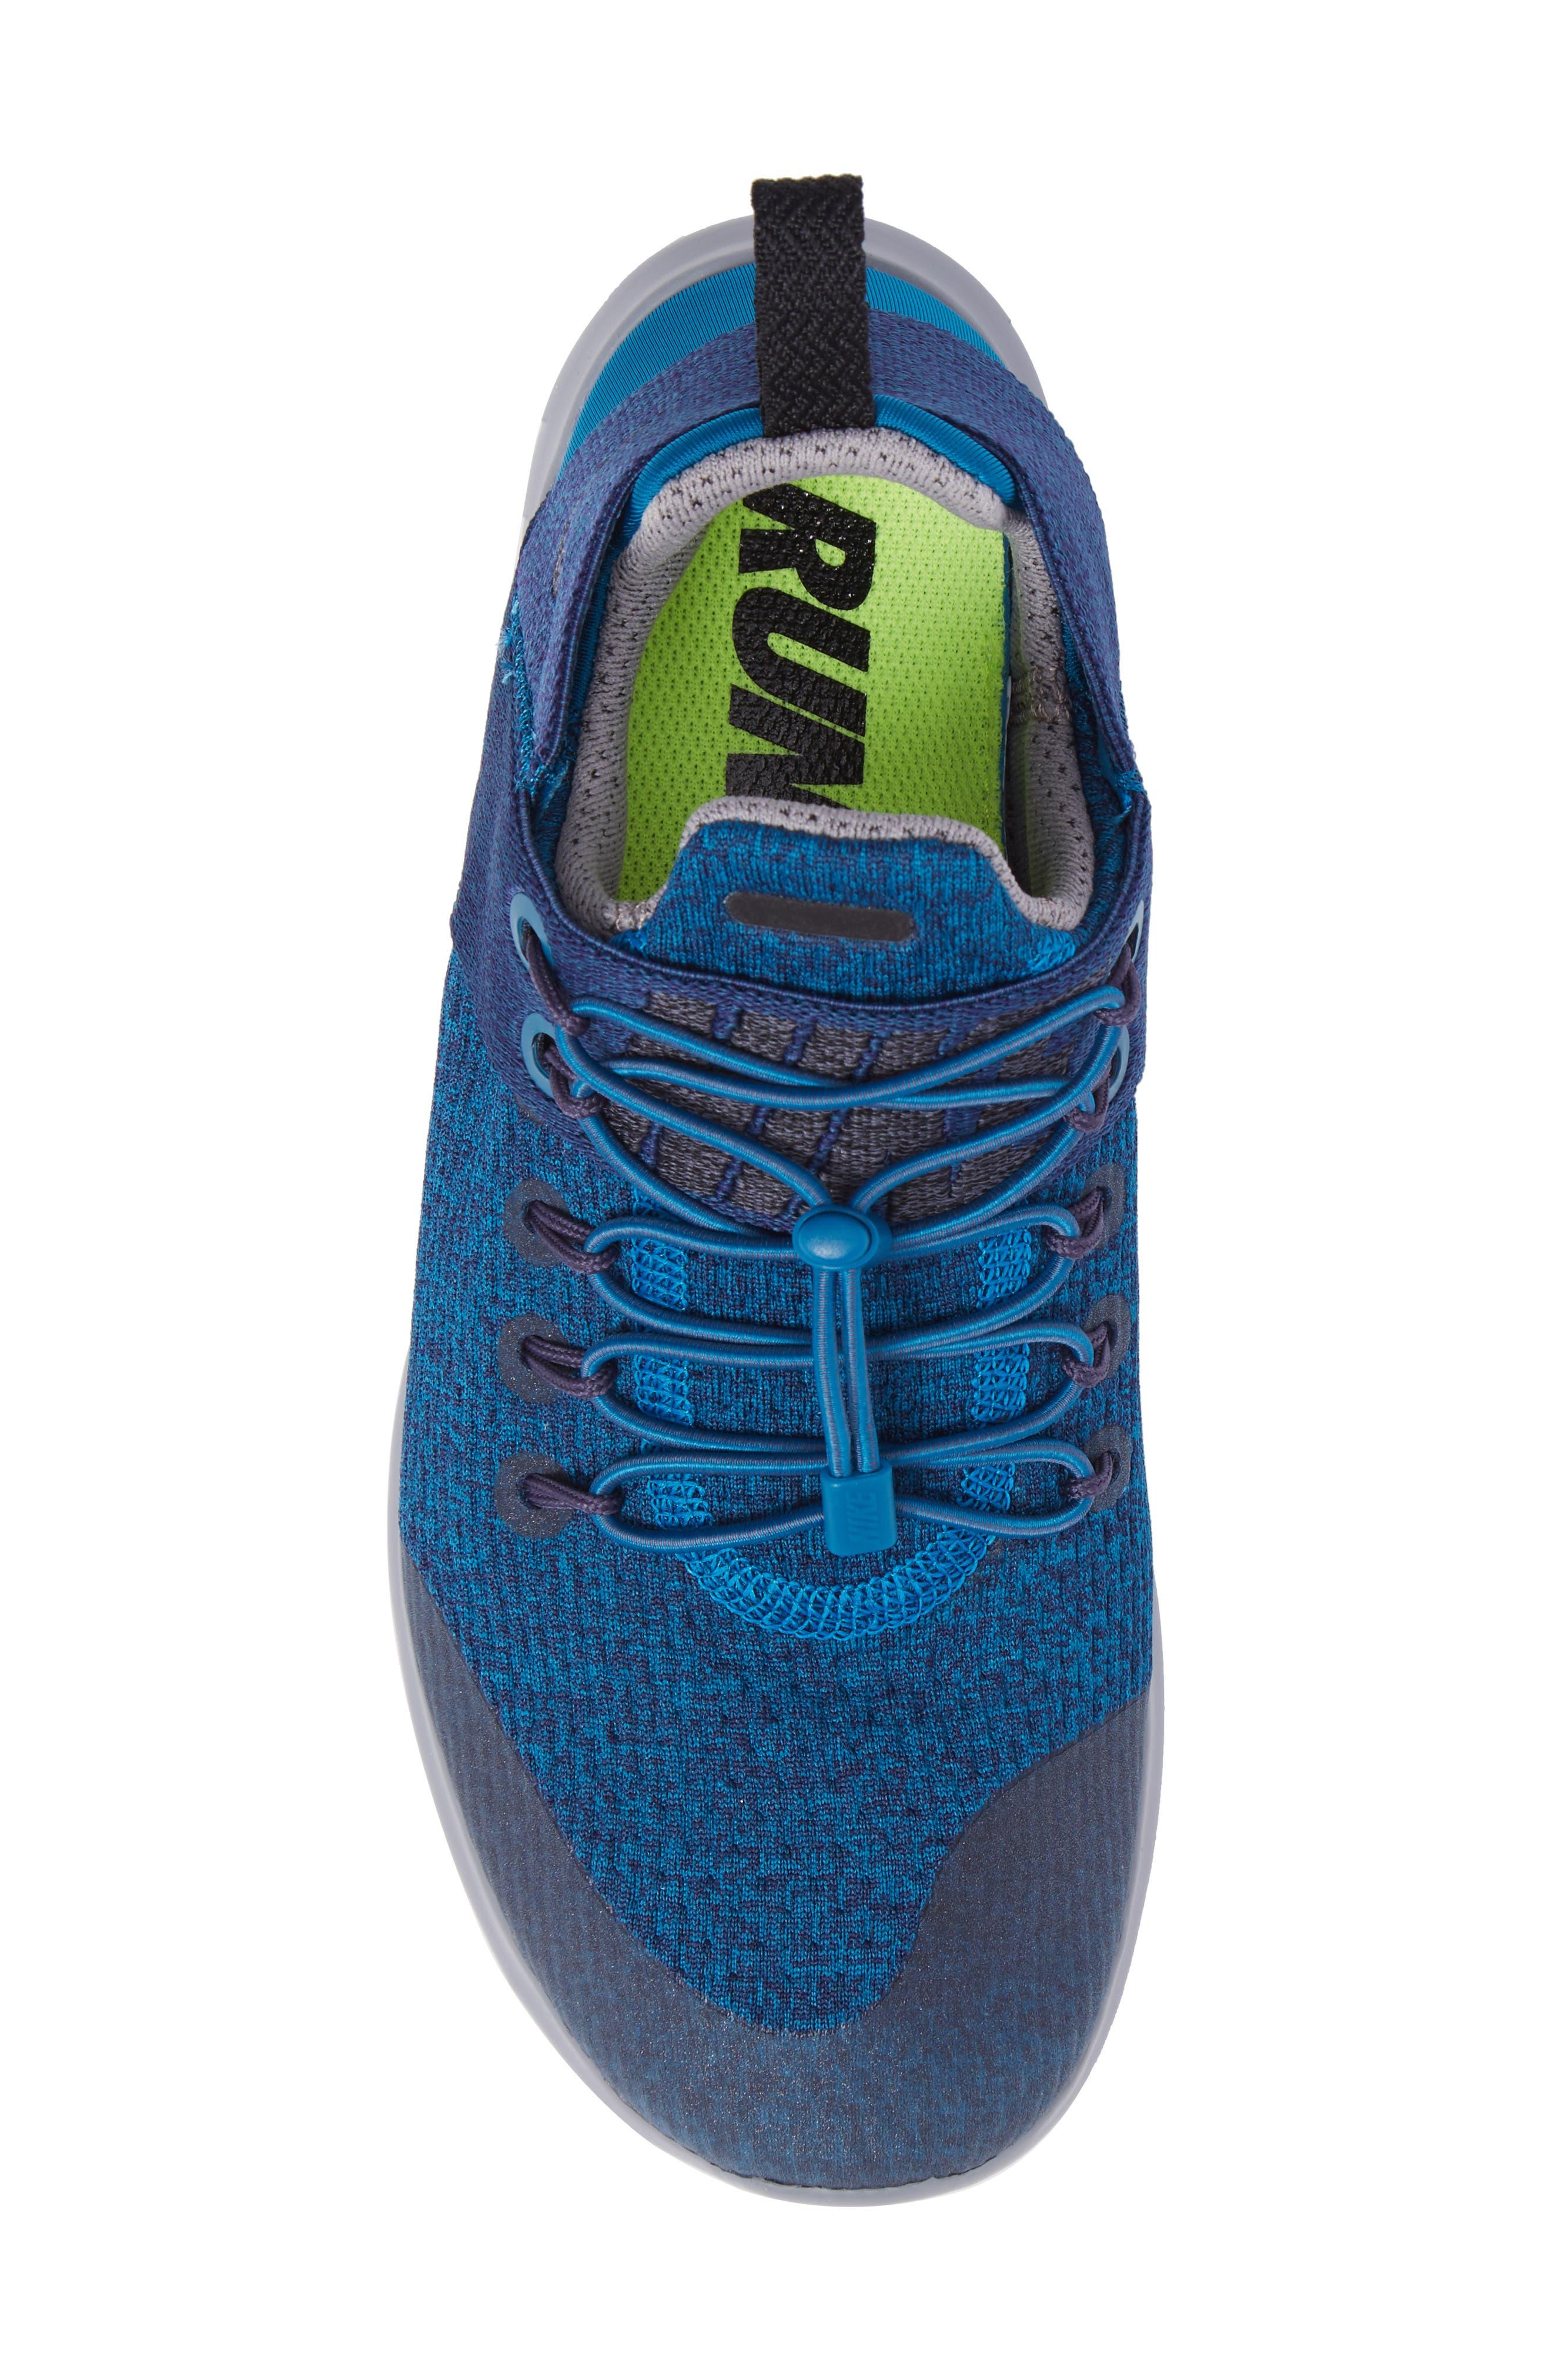 Free RN Commuter 2017 Premium Running Shoe,                             Alternate thumbnail 5, color,                             Green / Black/ Cobblestone